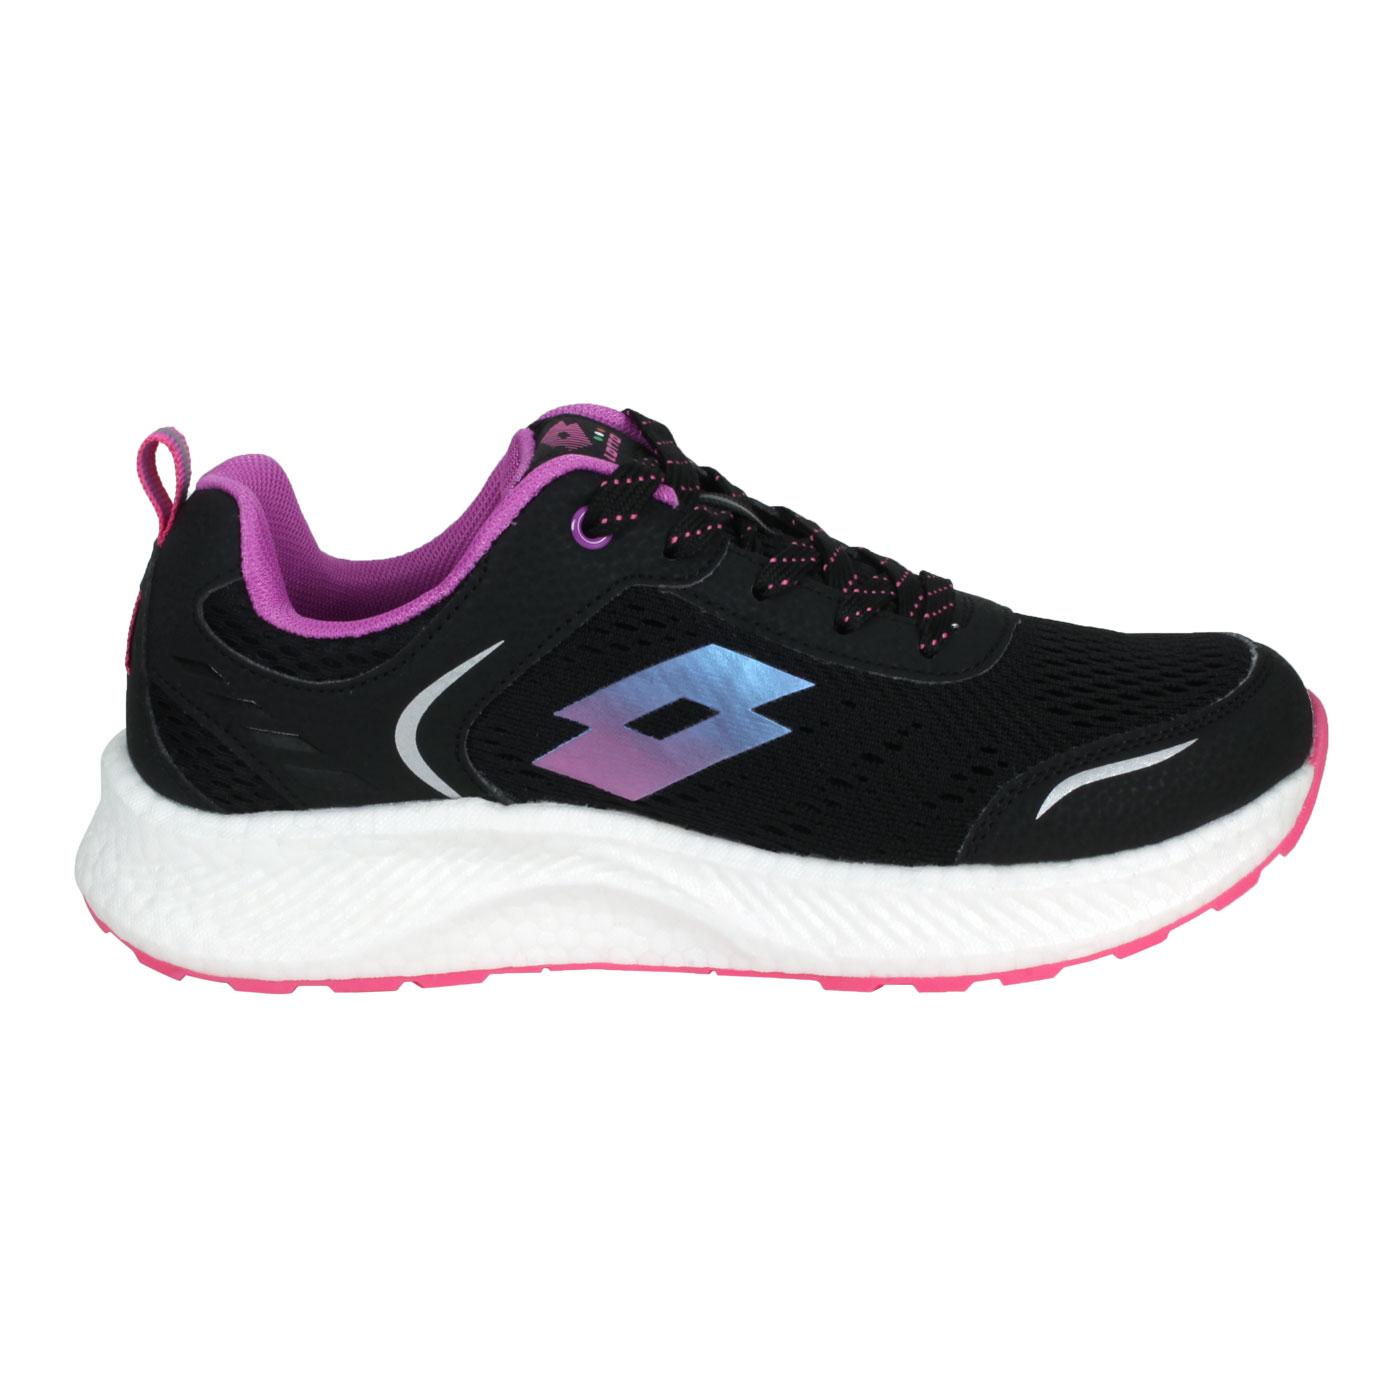 LOTTO 女款創跑鞋 LT1AWR3820 - 黑紫